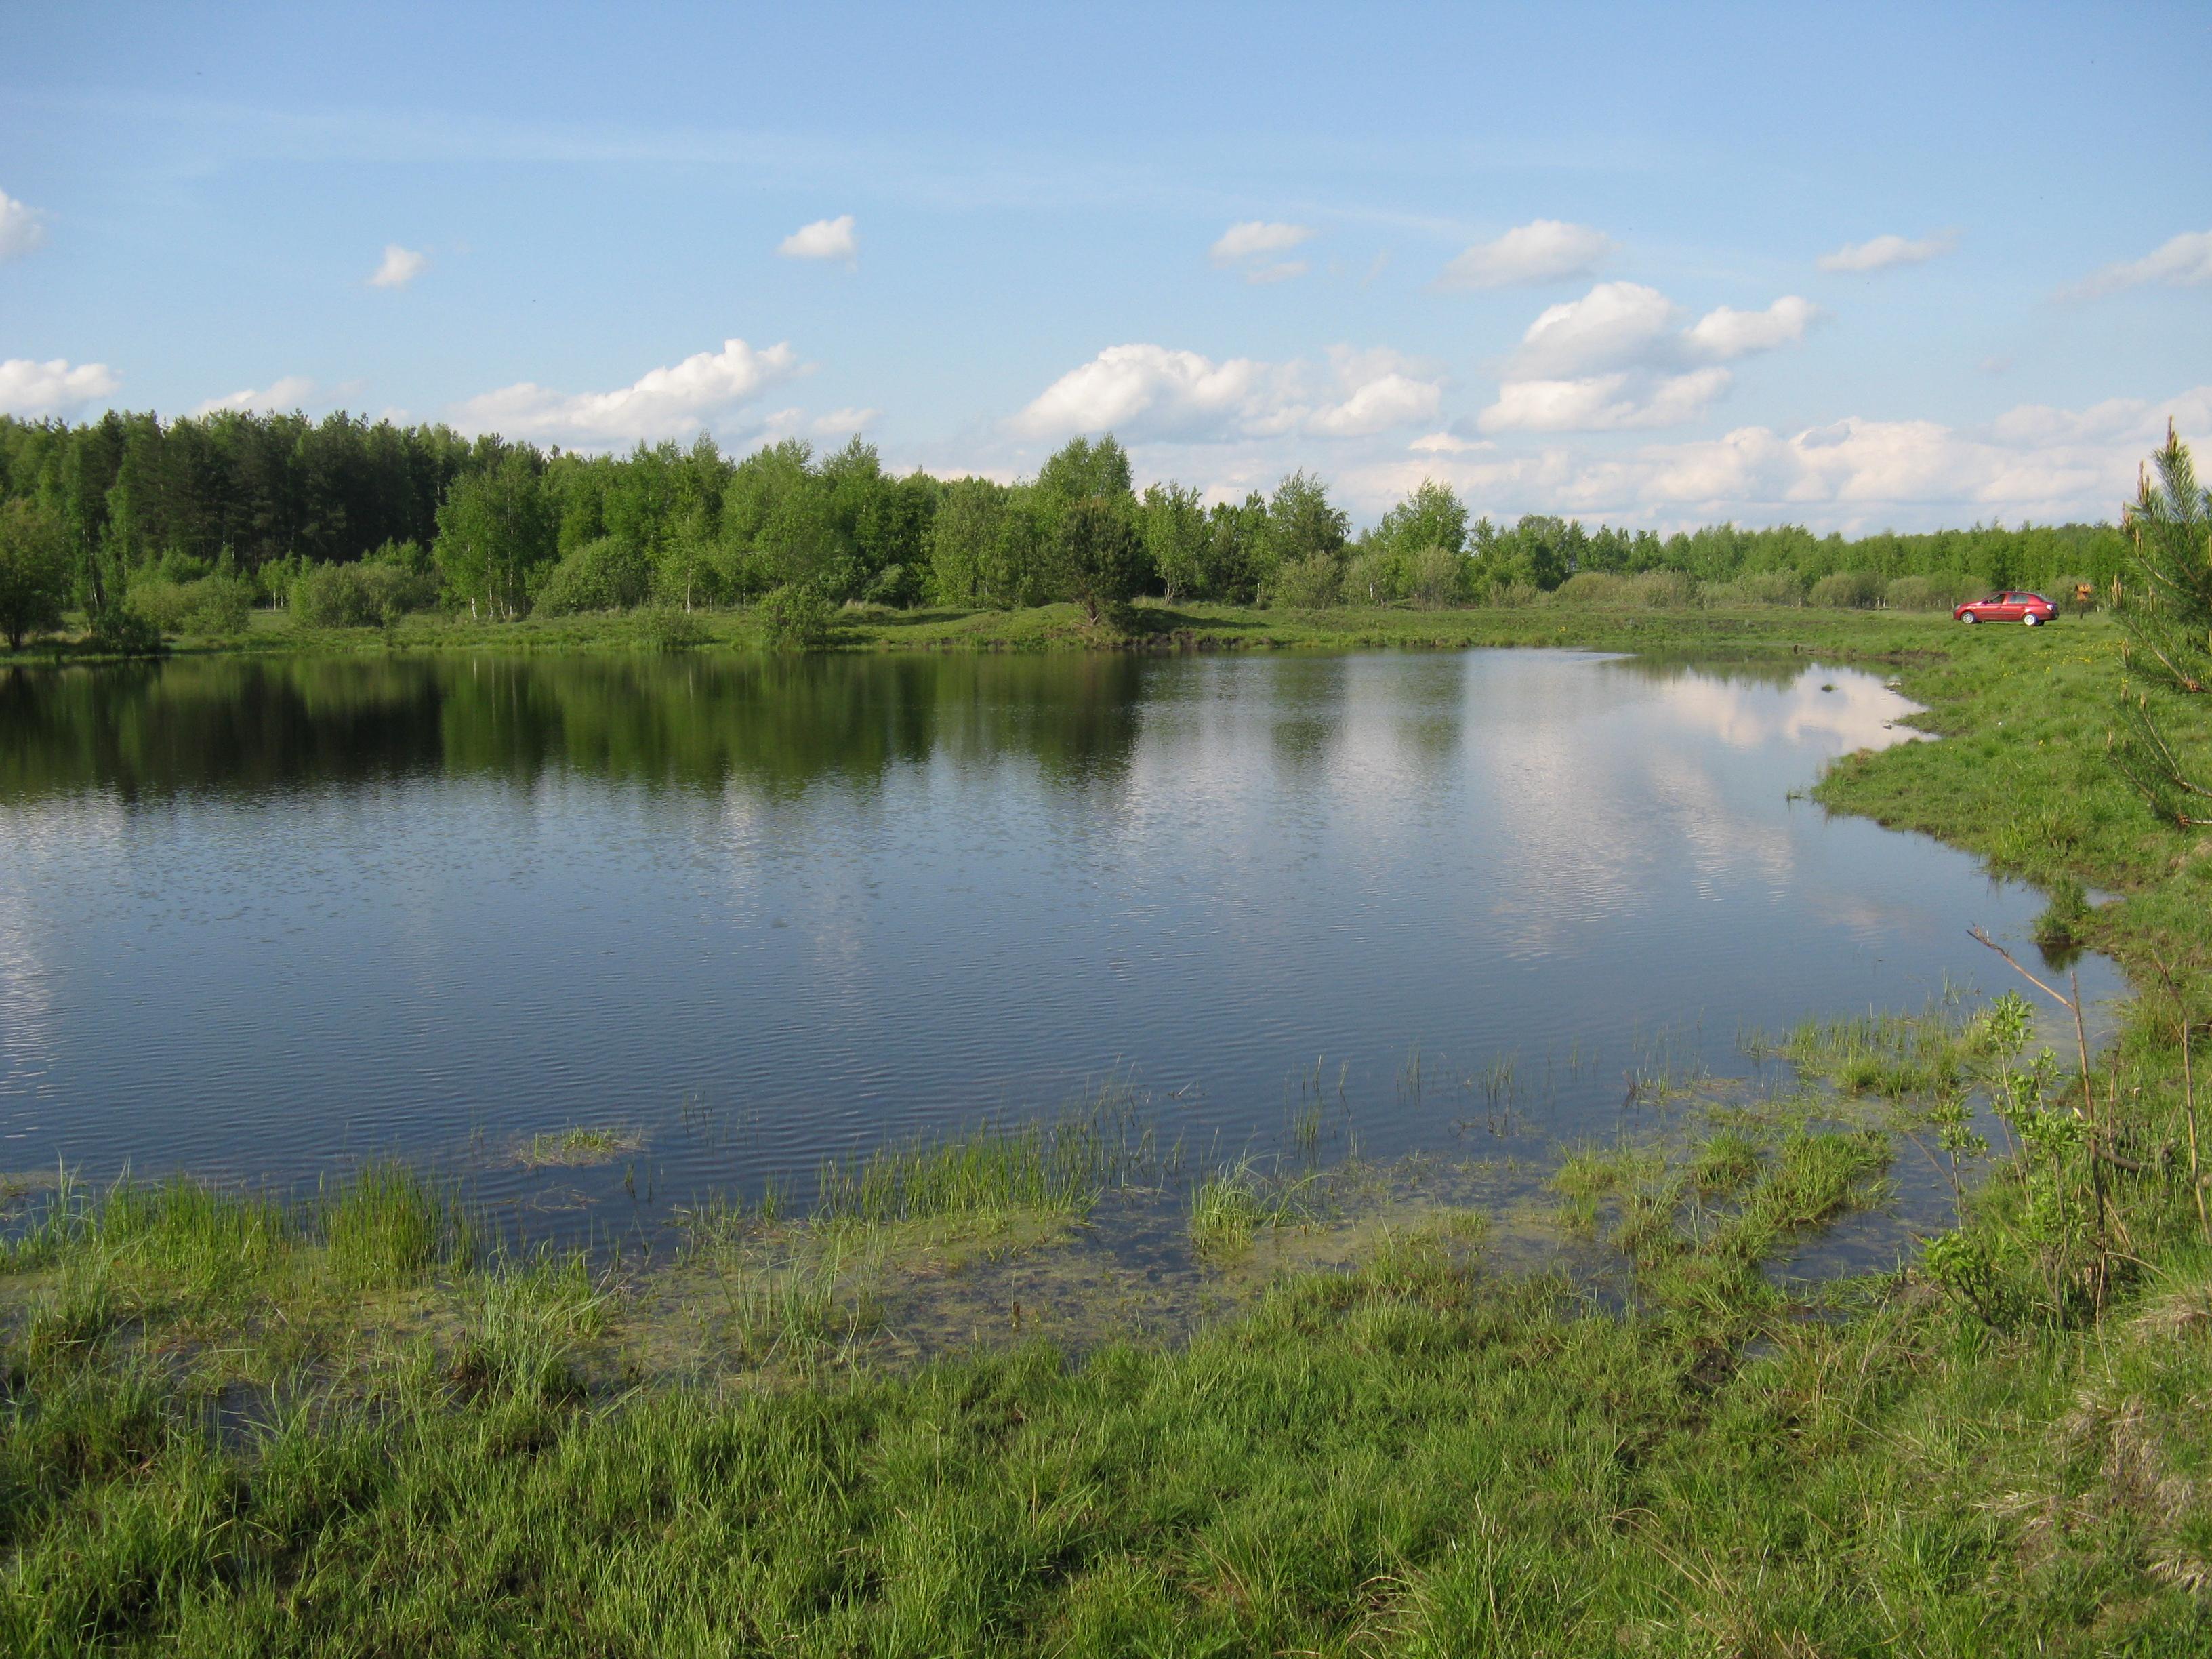 Лето  фото луга поля леса реки